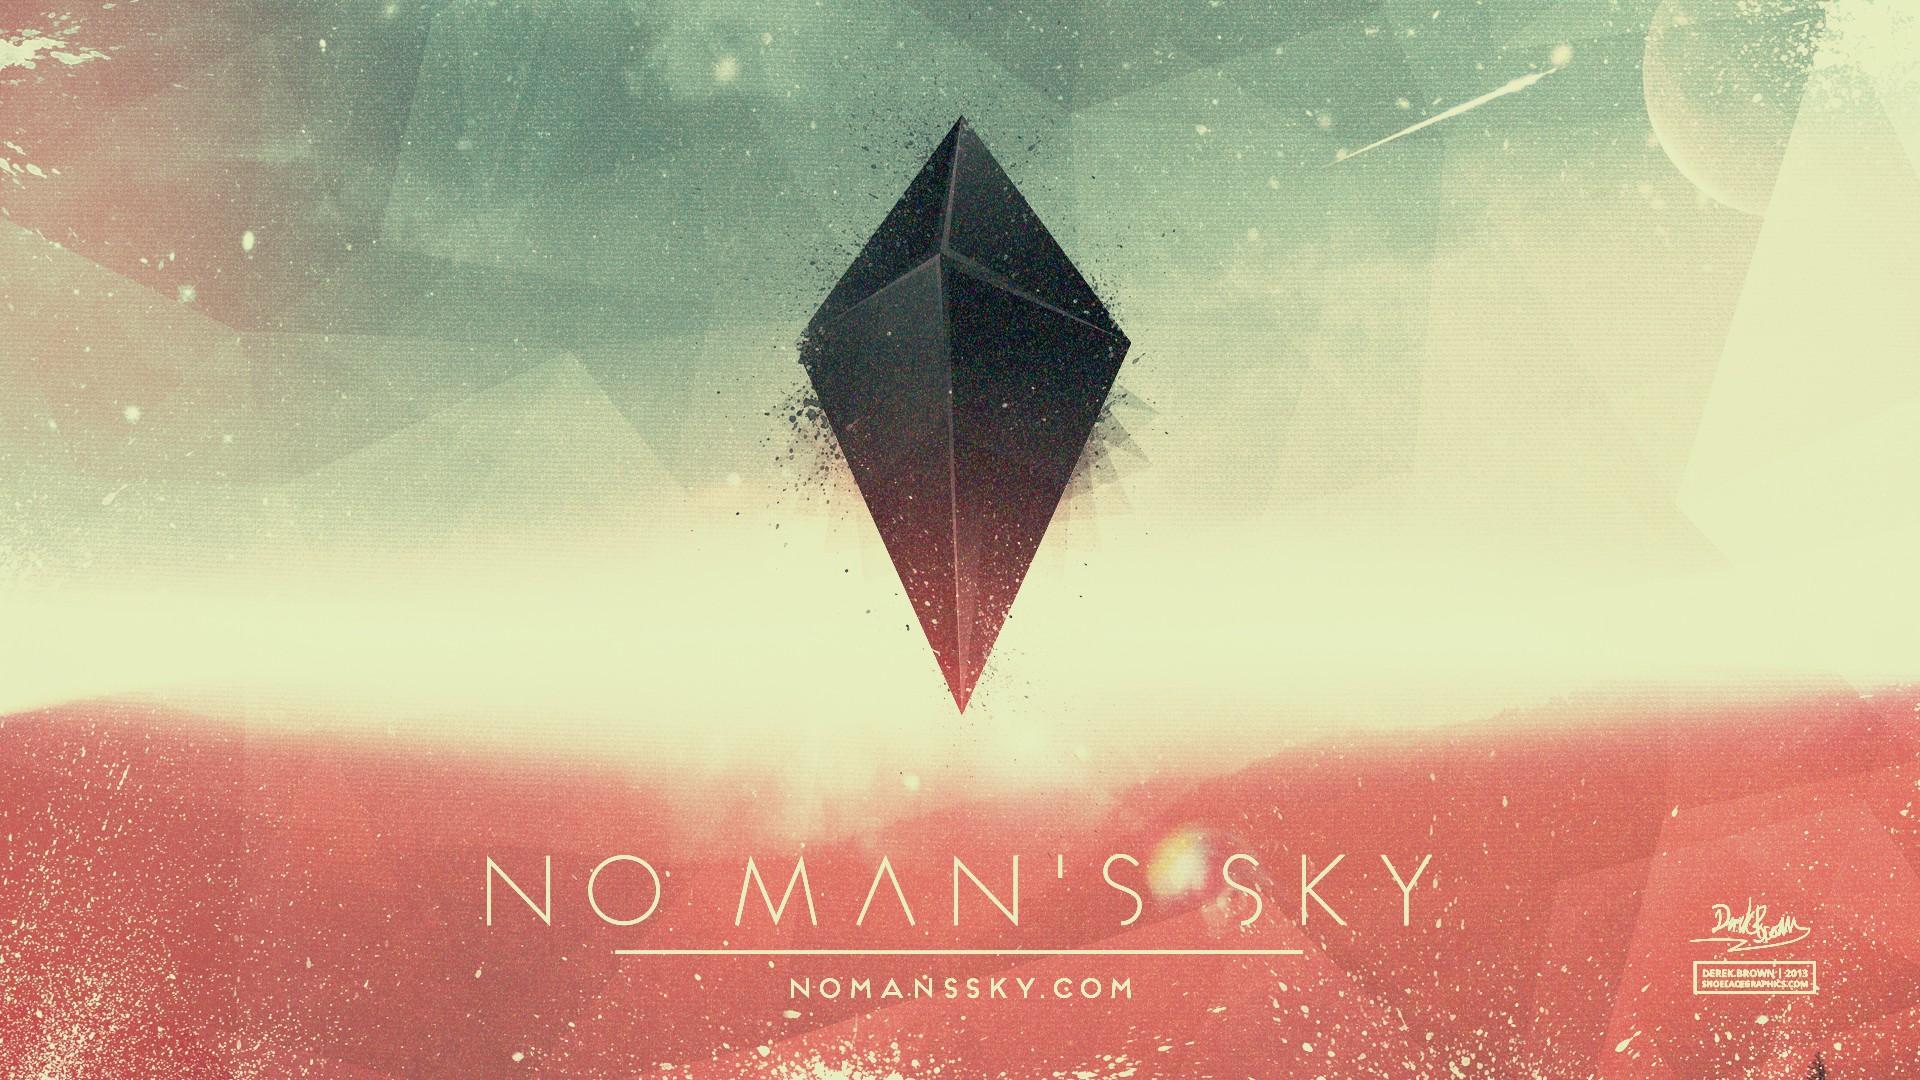 Free Download No Mans Sky Hd Wallpapers Screenshots Download